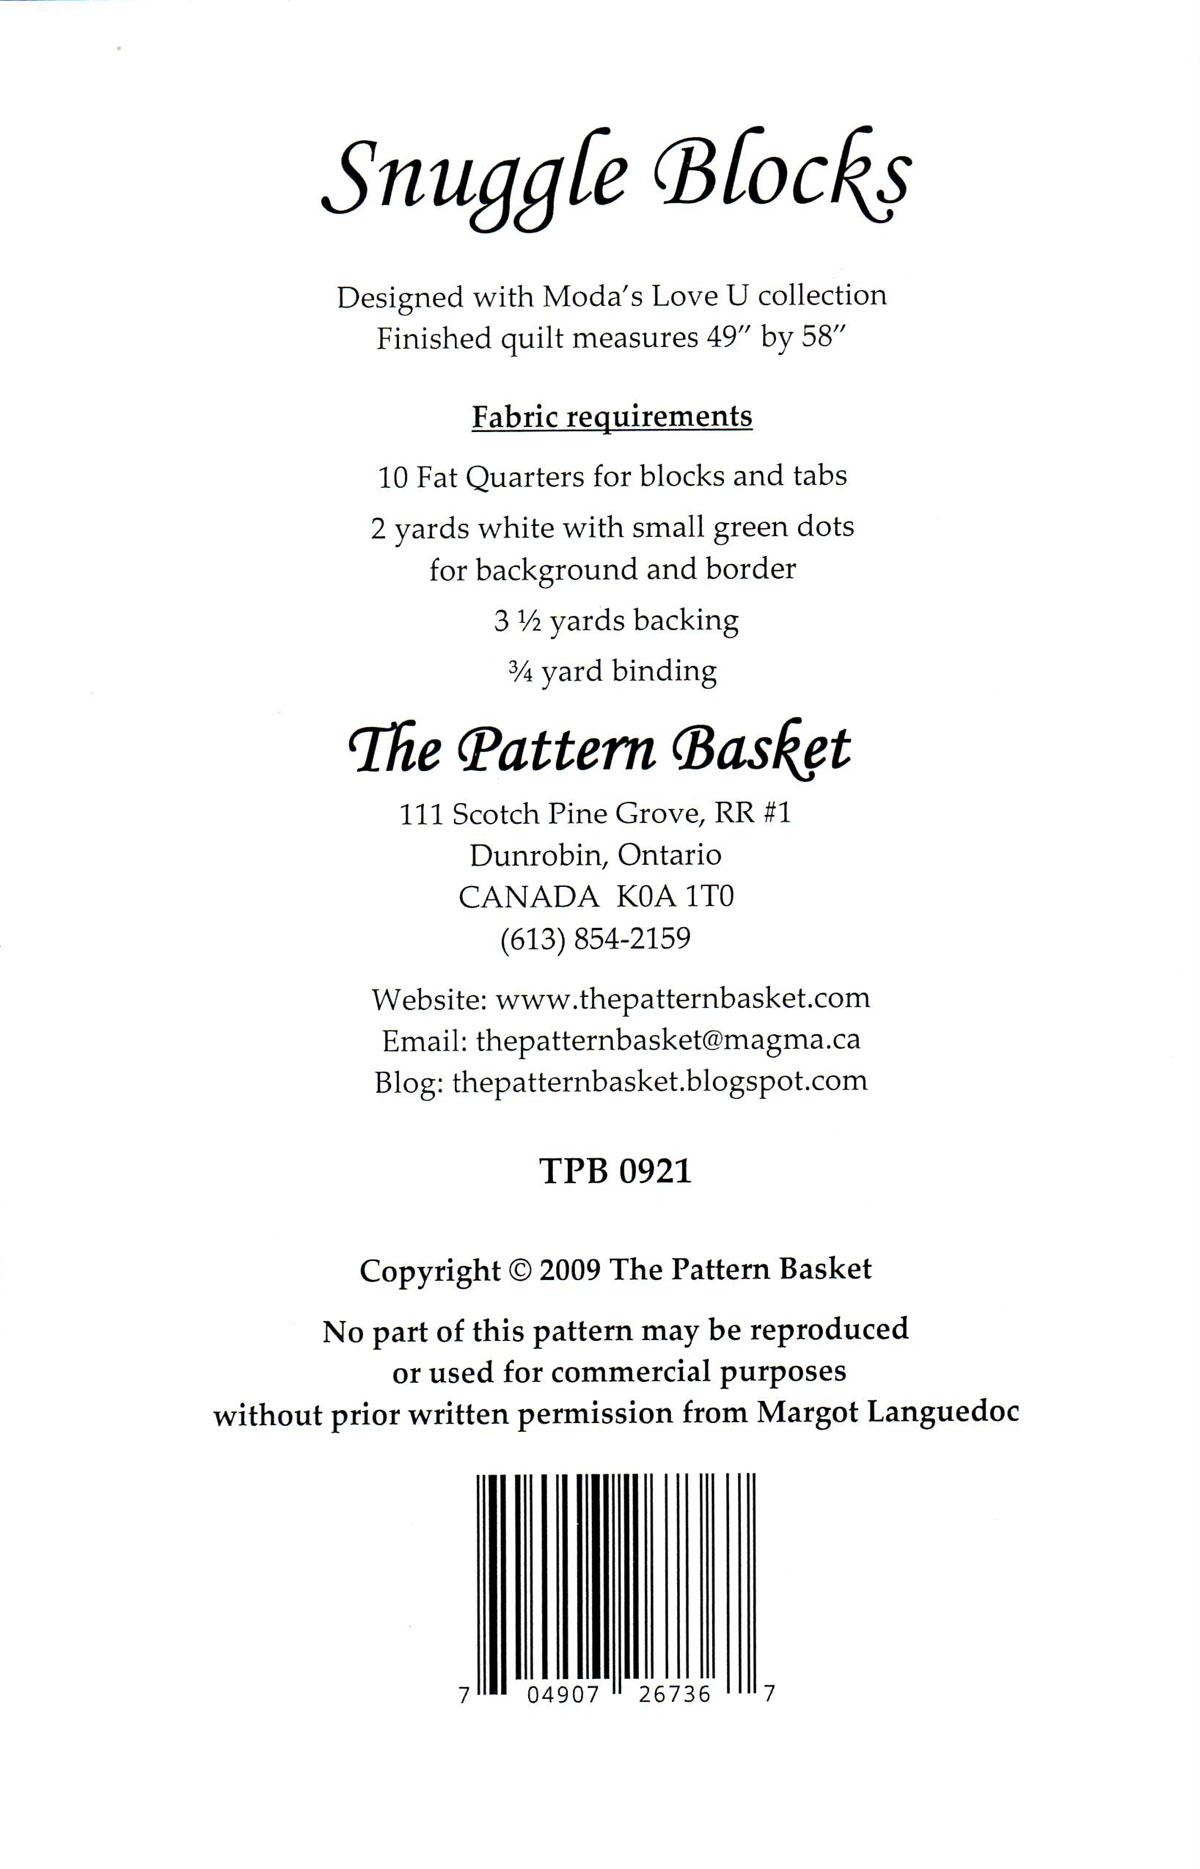 Snuggle-Blocks-sewing-pattern-the-pattern-basket-back